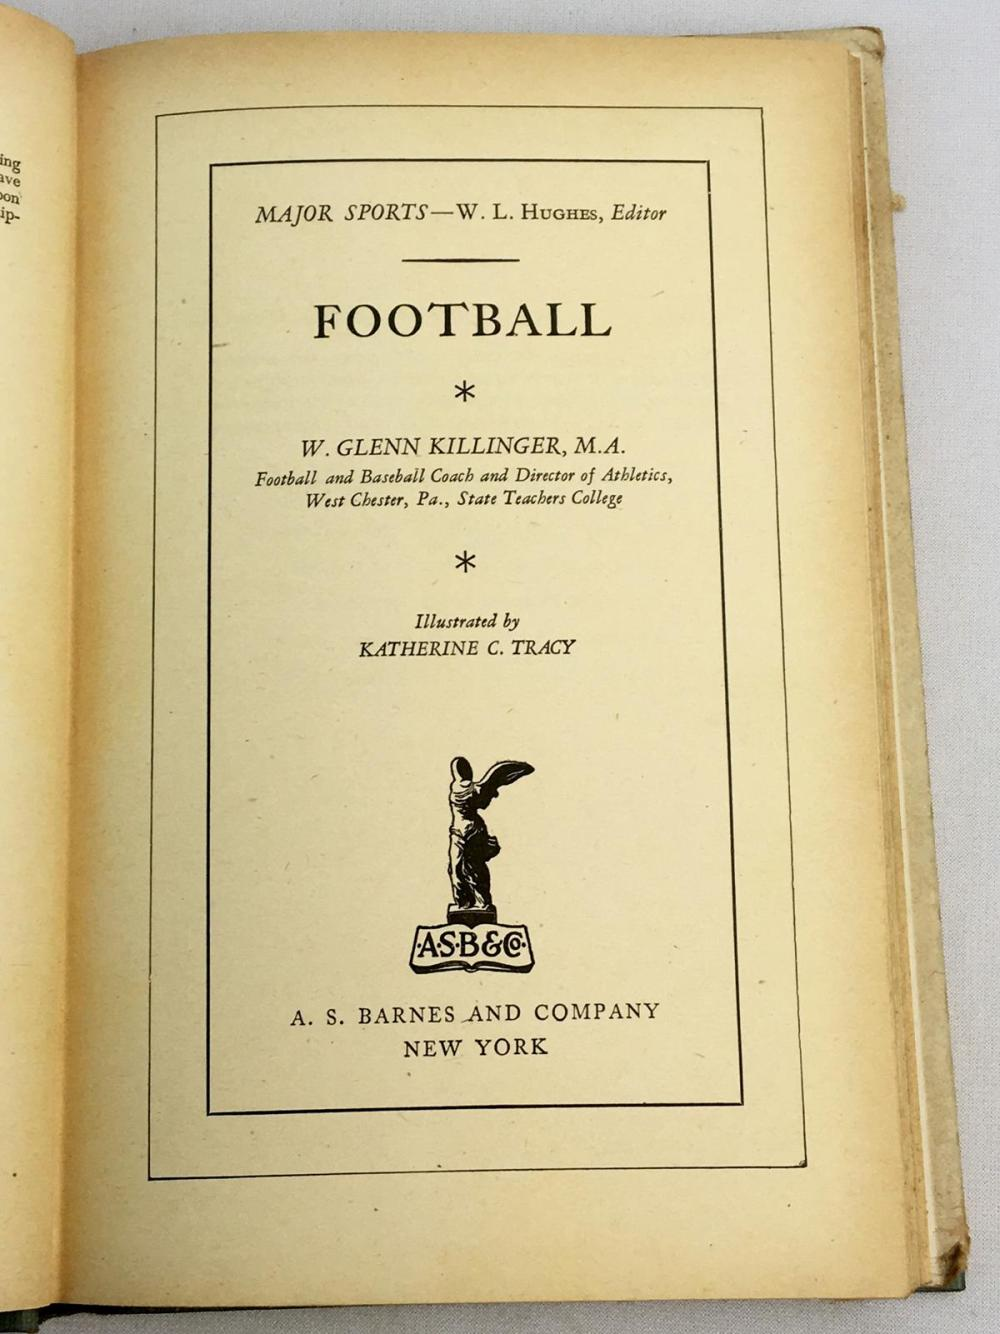 1946 Football by W. Glenn Killinger w/ Dust Jacket PHOTO ILLUSTRATED